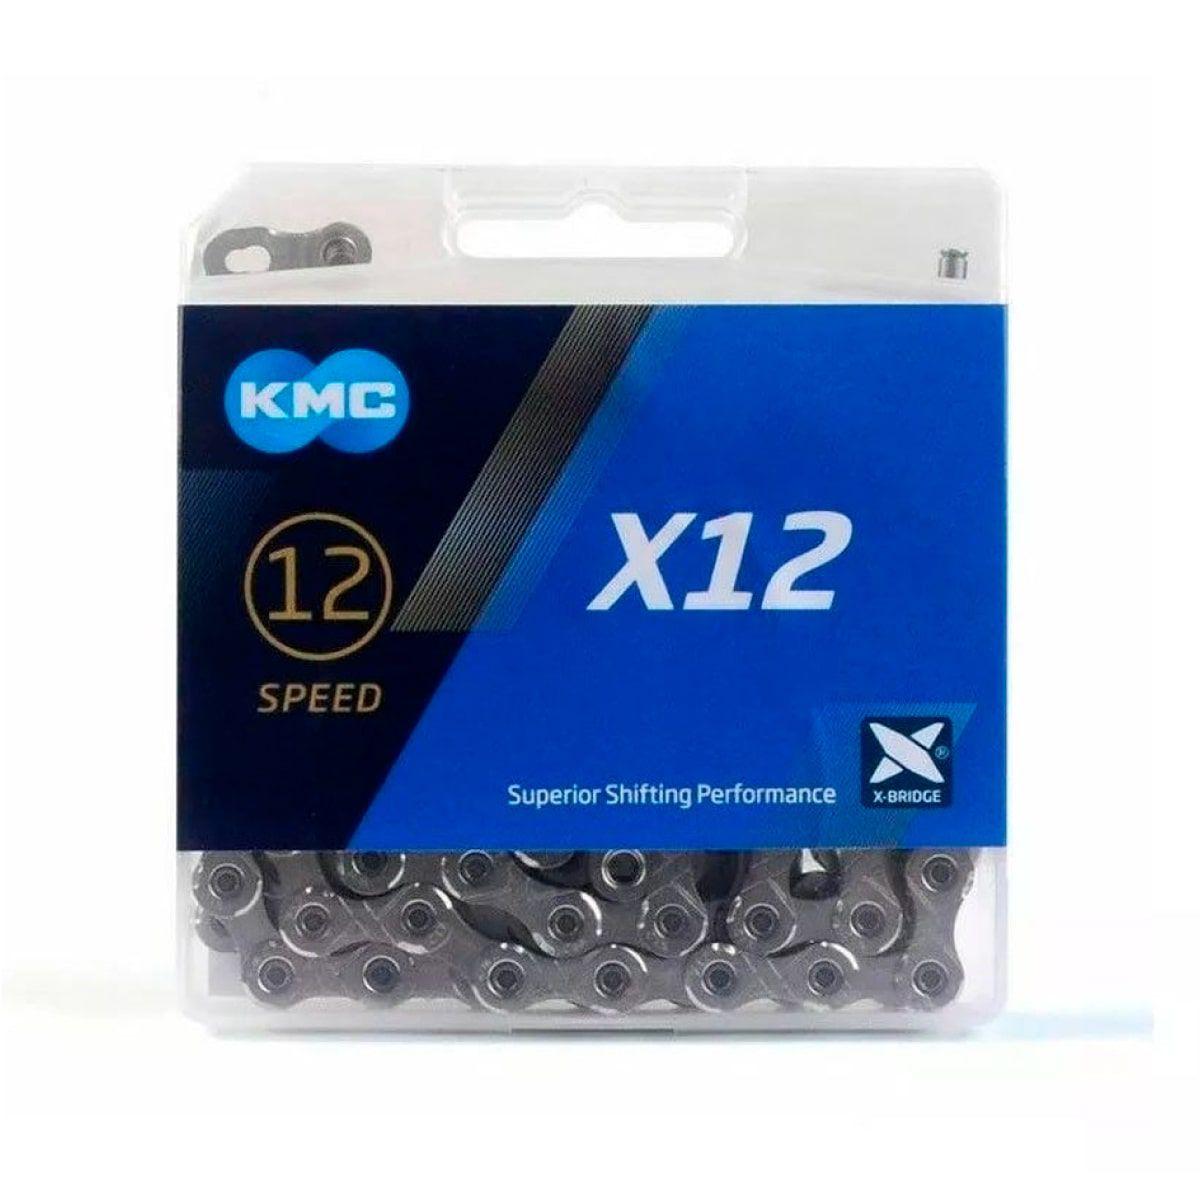 Corrente KMC 12v X12